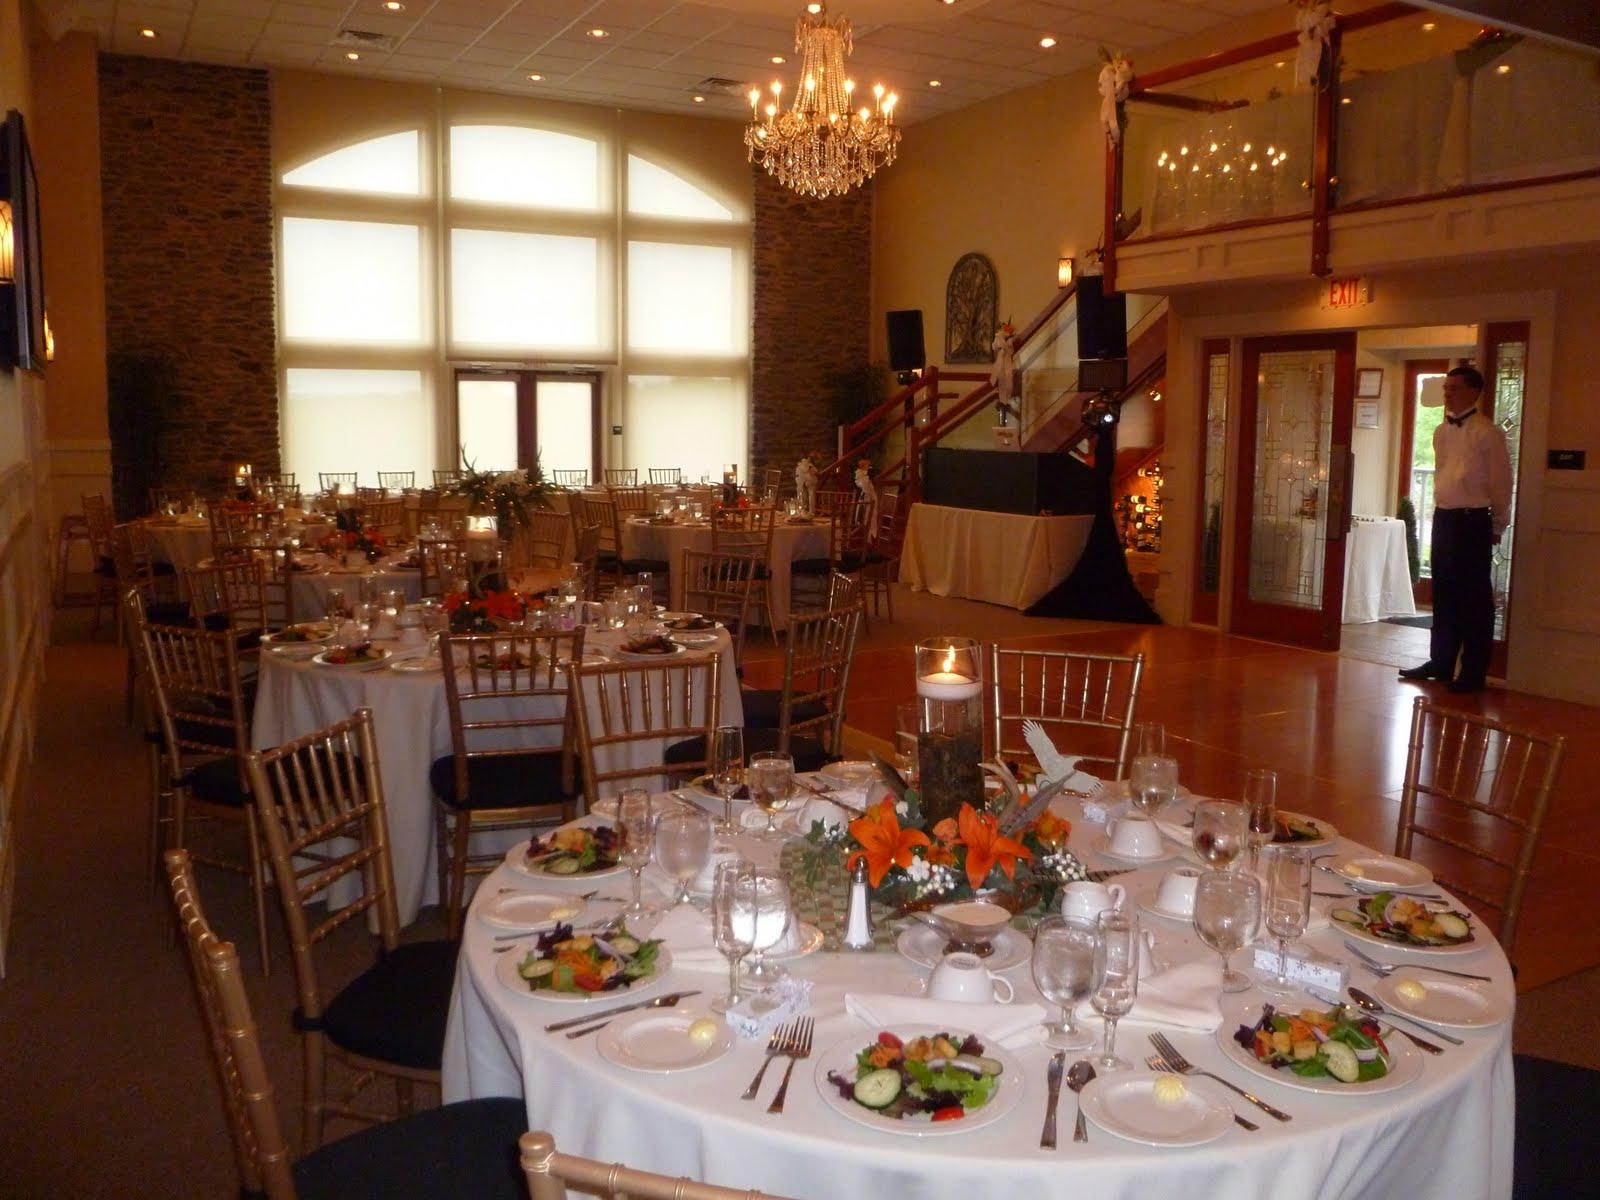 Weddings With Dj Adam Moyer Megan Matthews Wedding Reception At